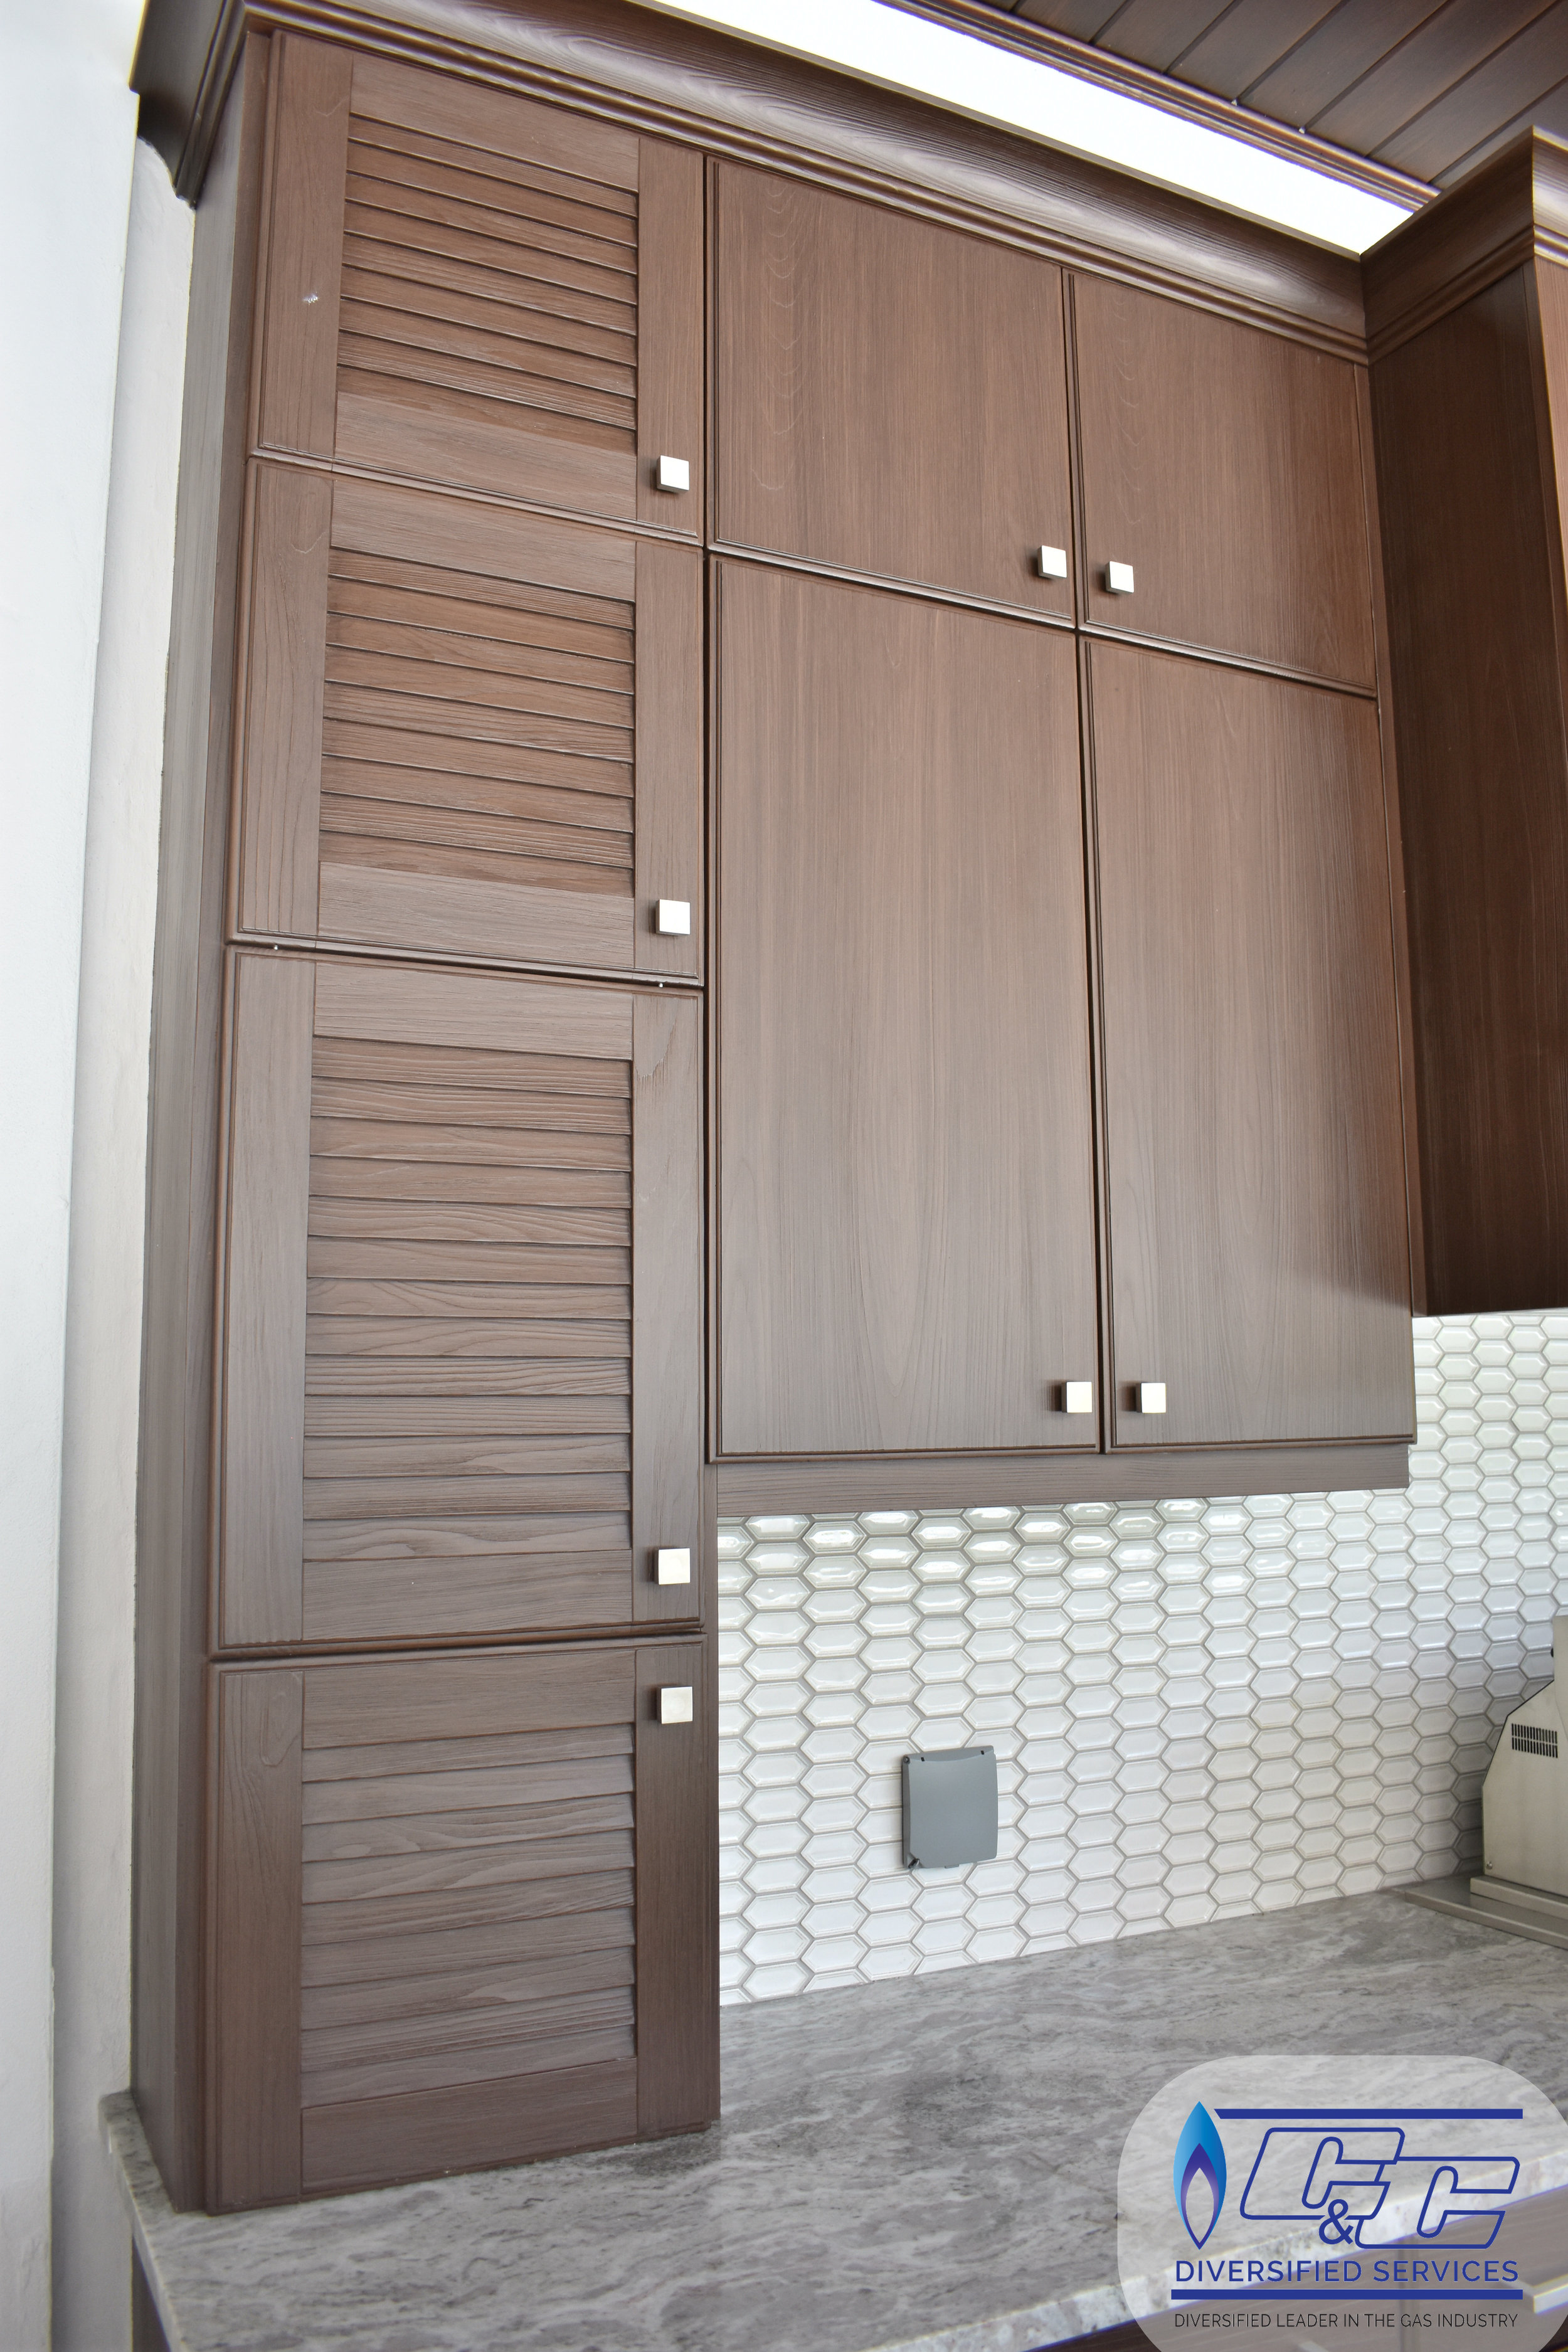 NatureKast Weatherproof Cabinetry - Cabinets